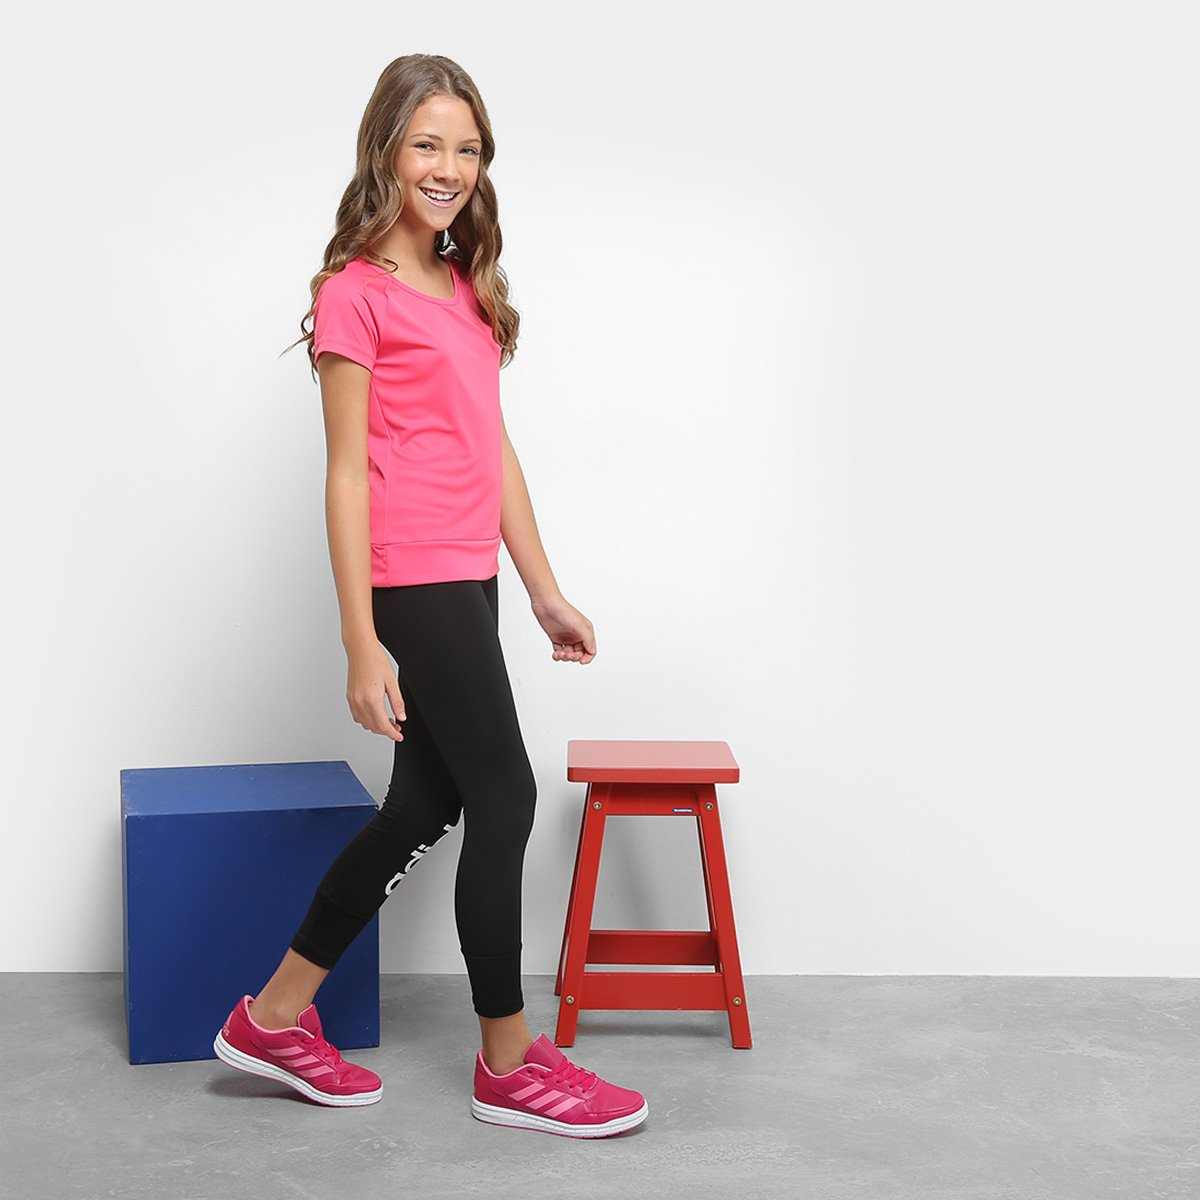 Yg Camiseta Mc Pink Gu Infantil Infantil Adidas Adidas Camiseta FYX4xdXqwT